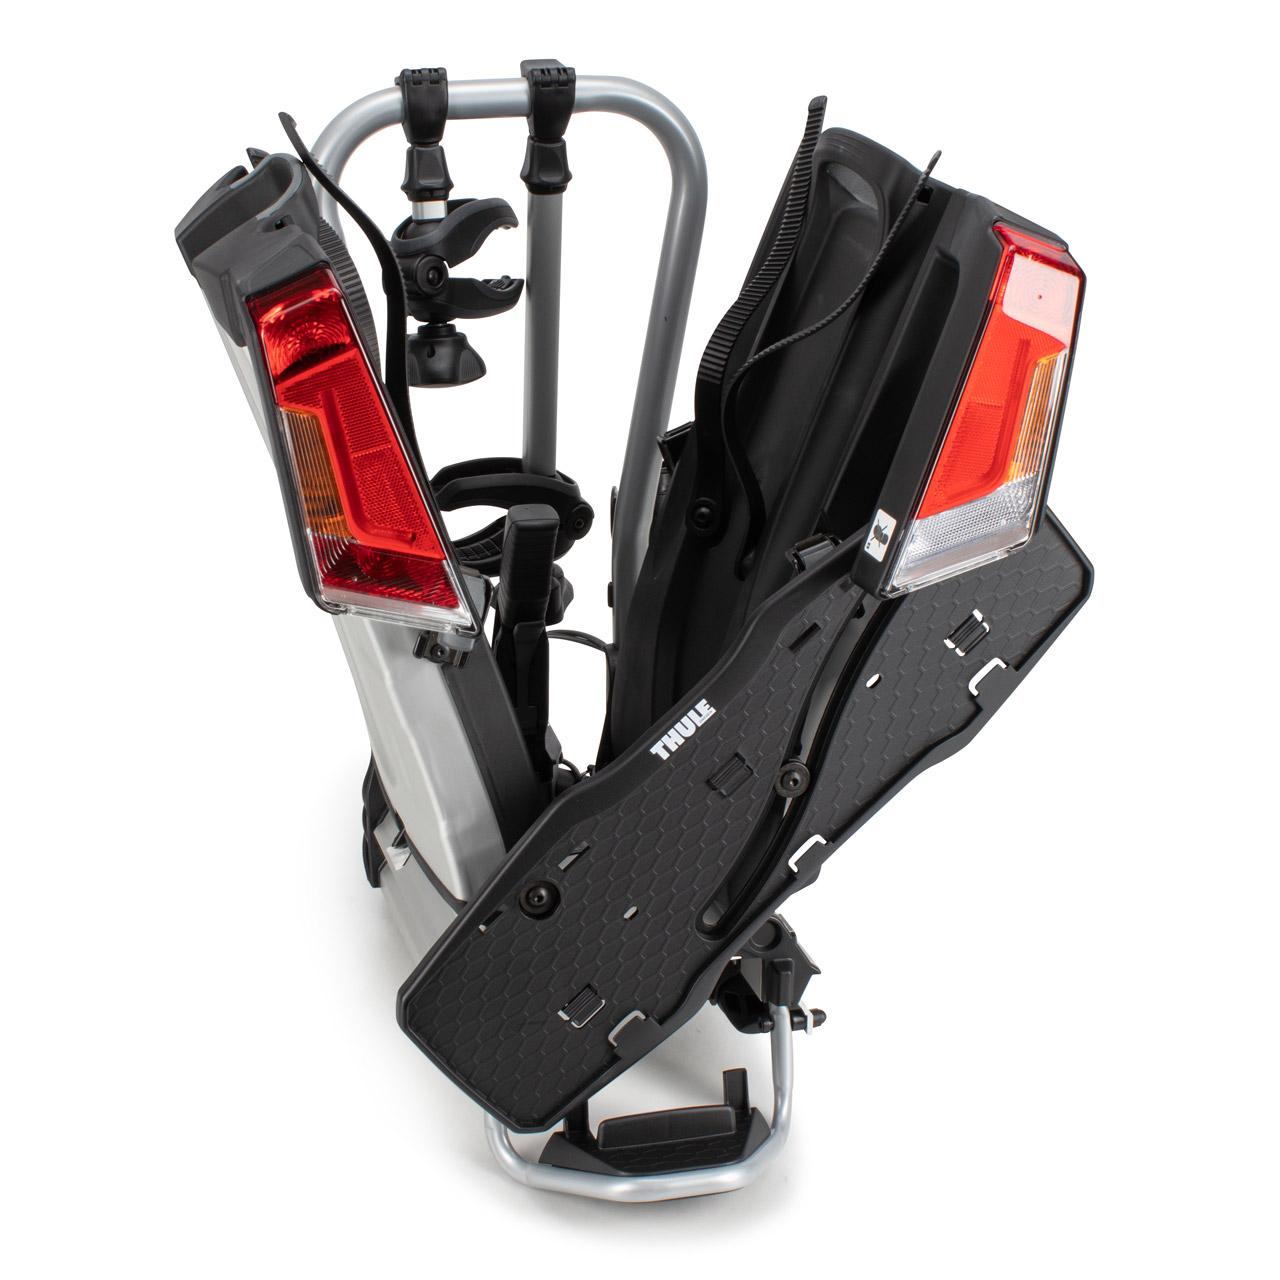 THULE 931014 EasyFold 931 Fahrradträger AHK Kupplungsträger E-Bike für 2 Räder